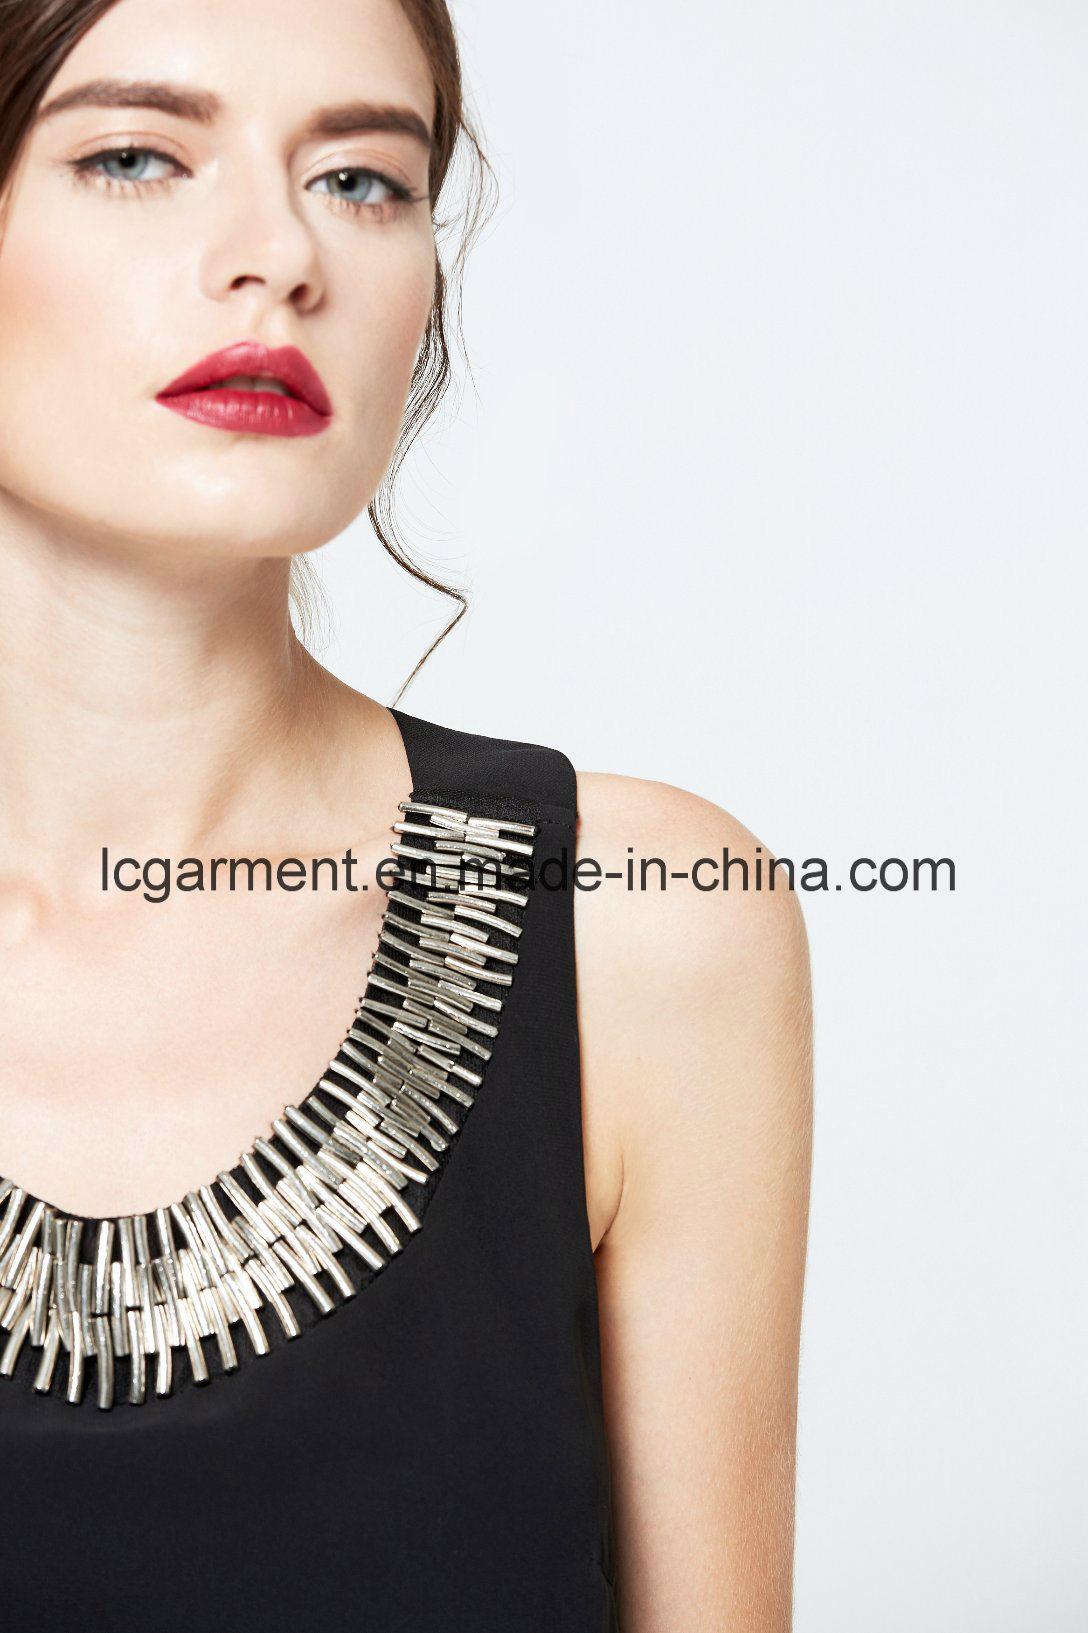 Black Chiffon Woman Dress Sleeveless Halter Neck Backless Maxi Latest Dress